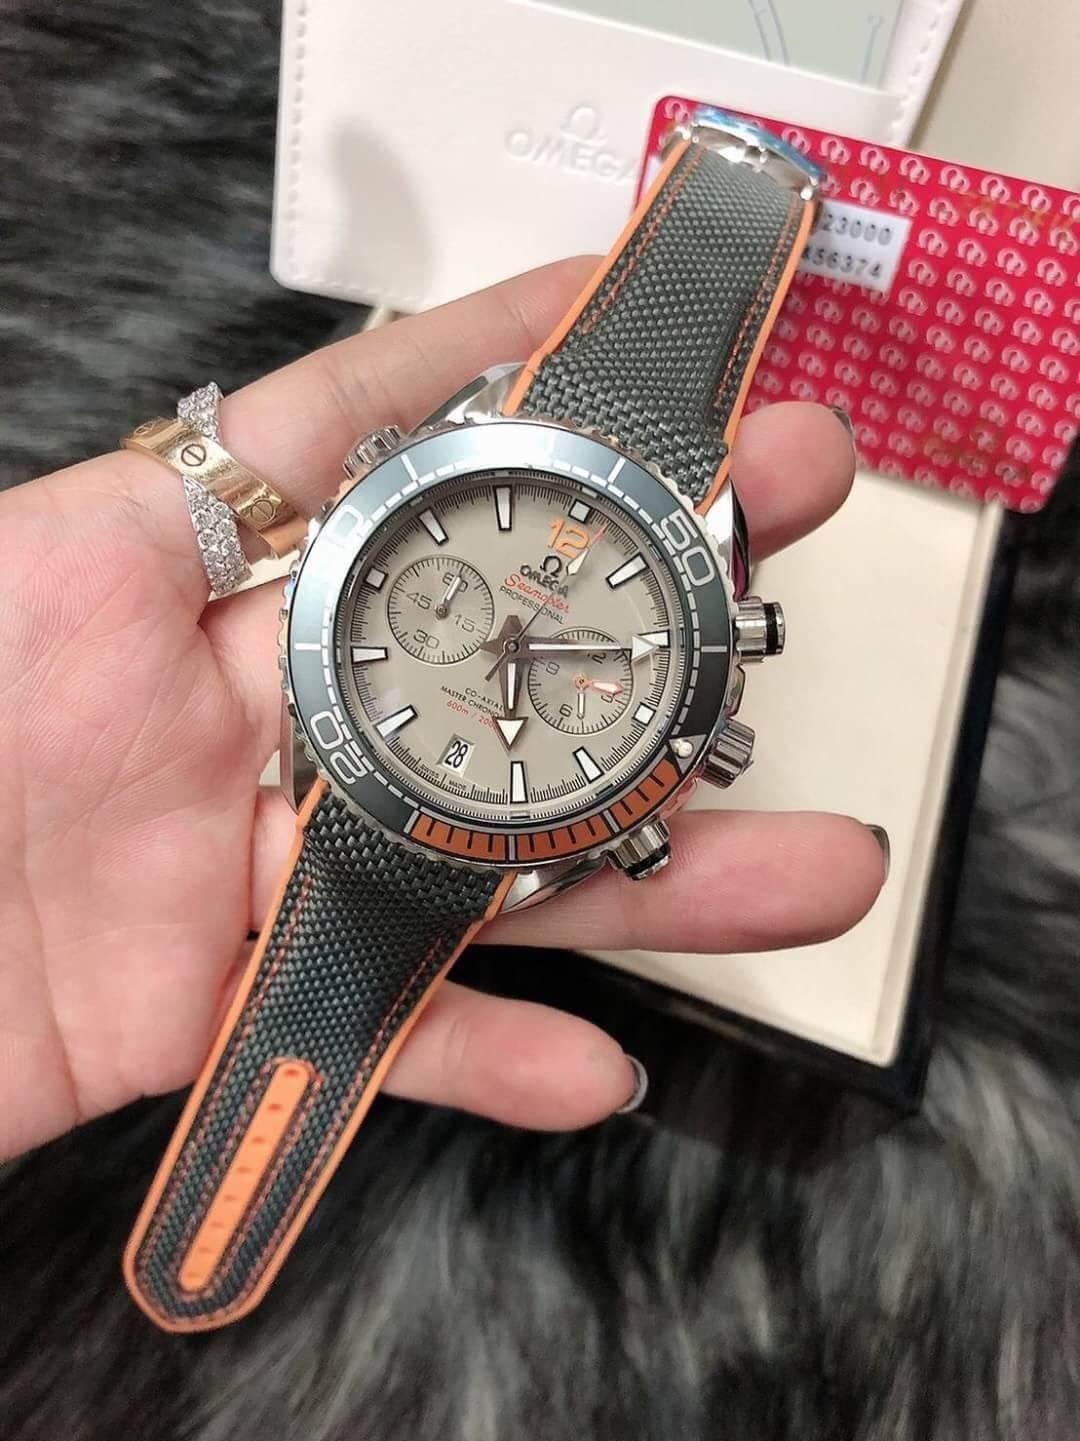 Omega Seamaster Planet Ocean 600M Gray Dial nylon wrist band